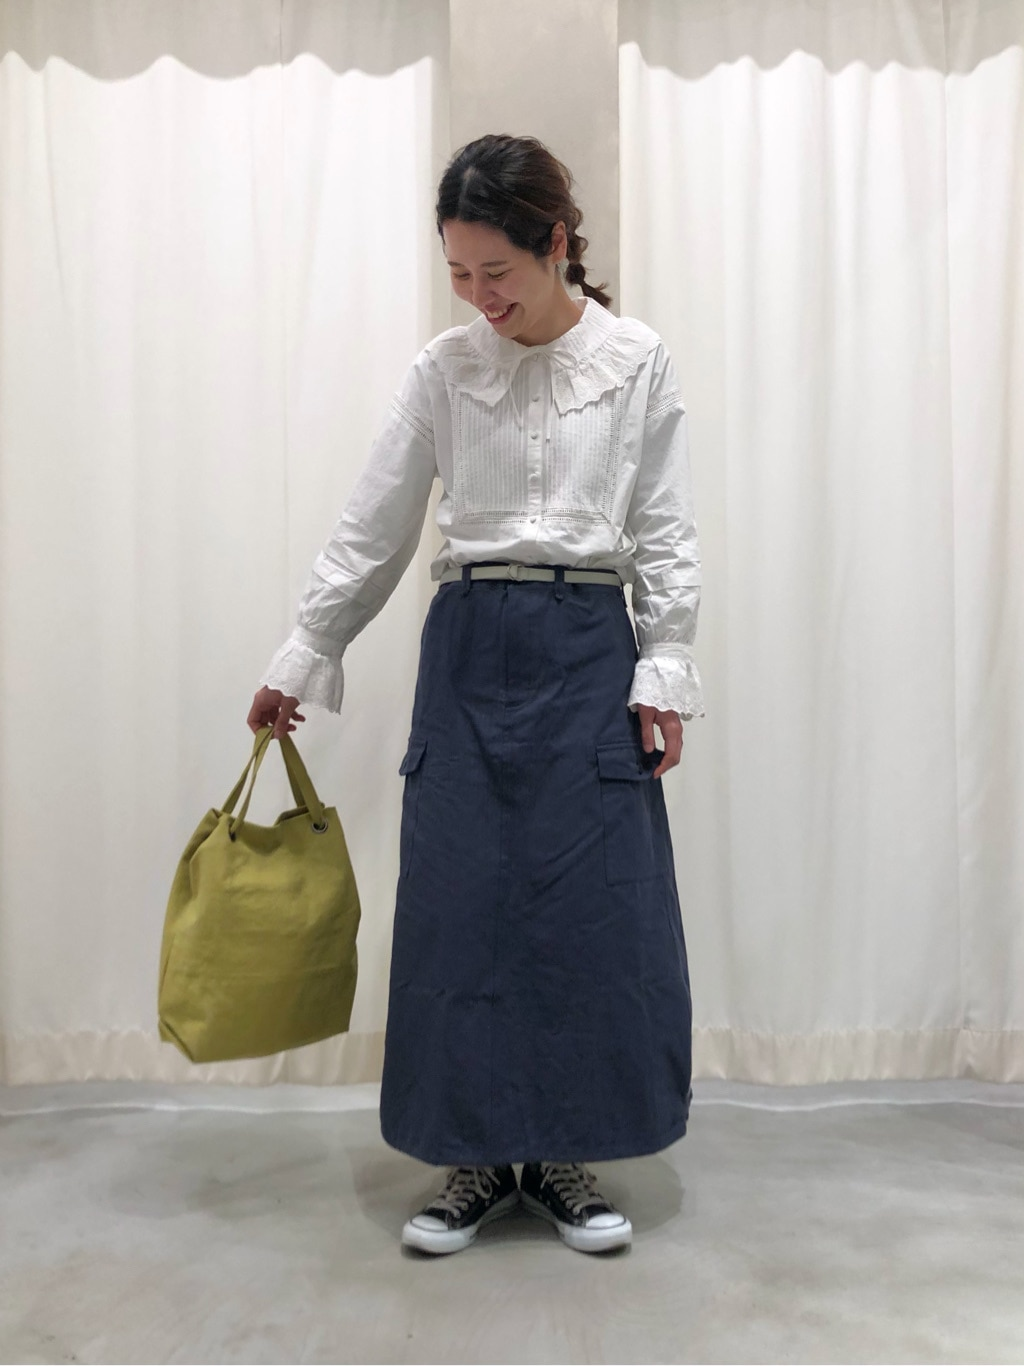 CHILD WOMAN , PAR ICI 東京スカイツリータウン・ソラマチ 2021.02.12